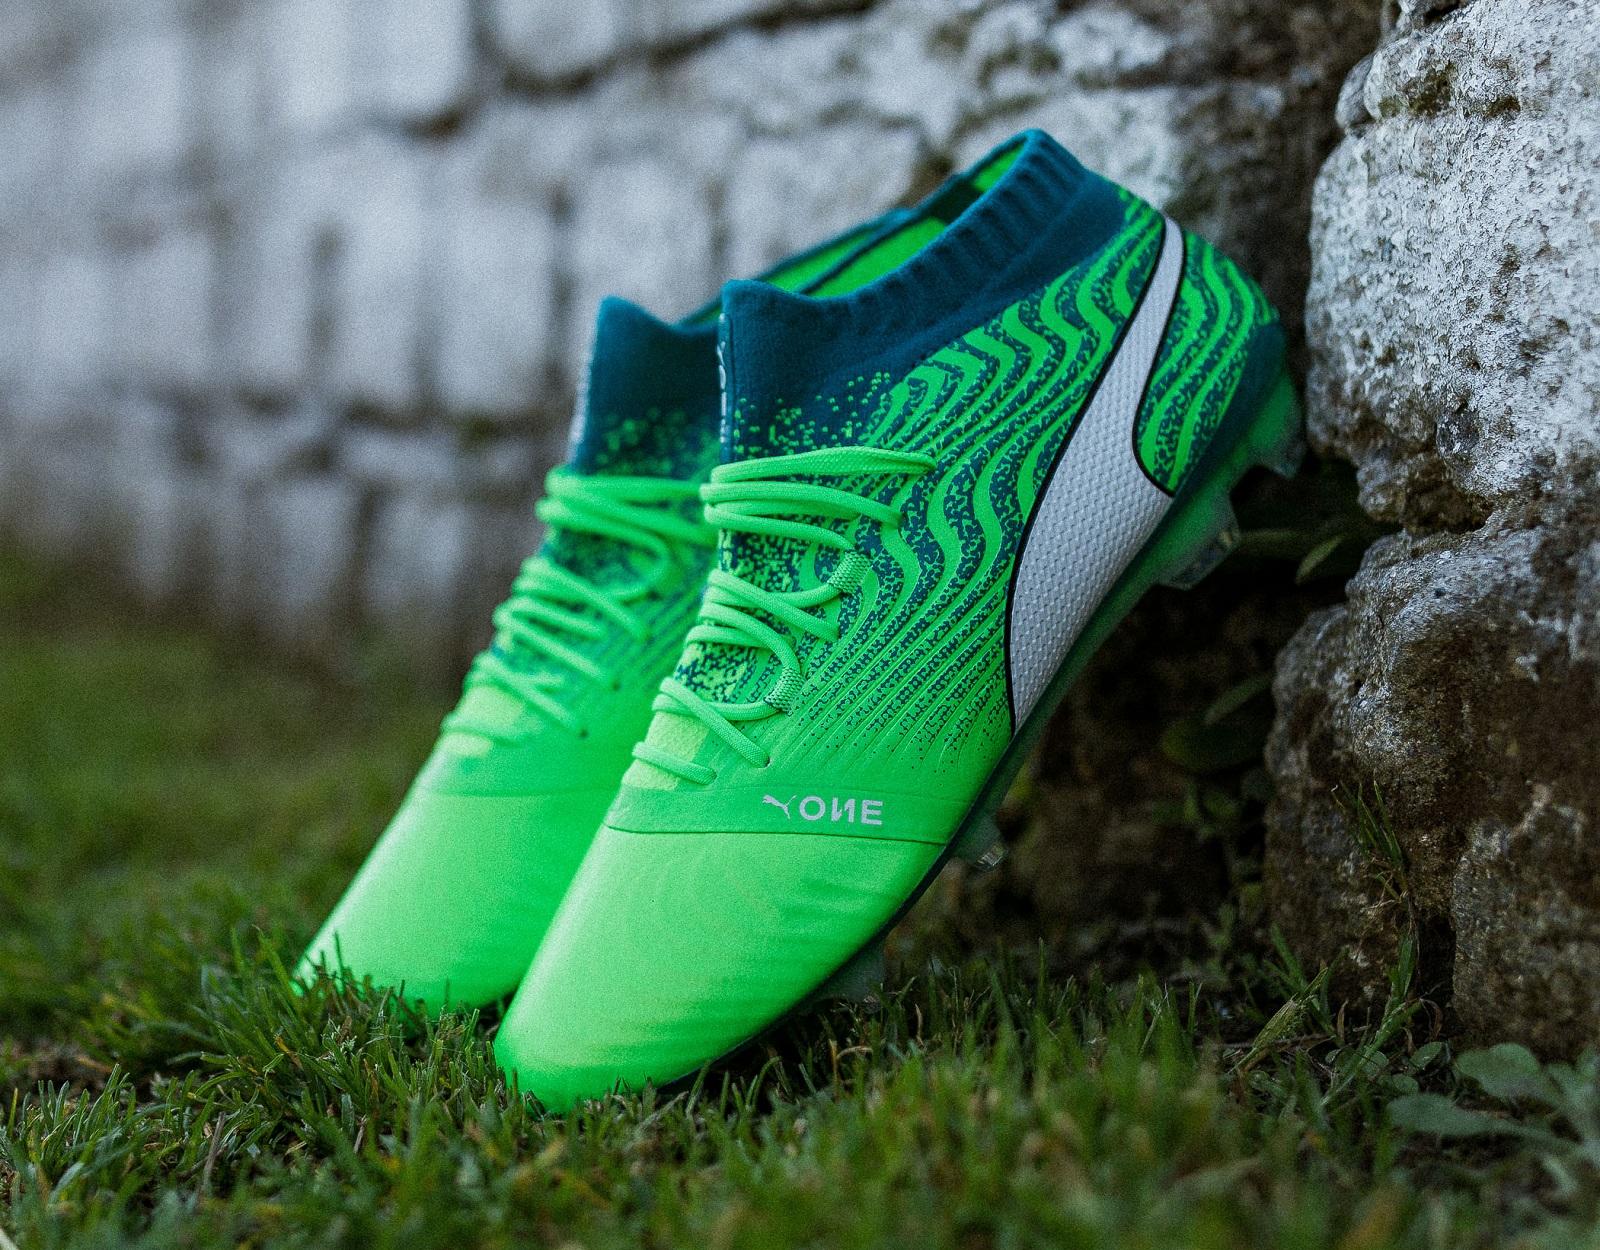 14375e054 Puma ONE 18.1 Frenzy Pack | Soccer Cleats 101